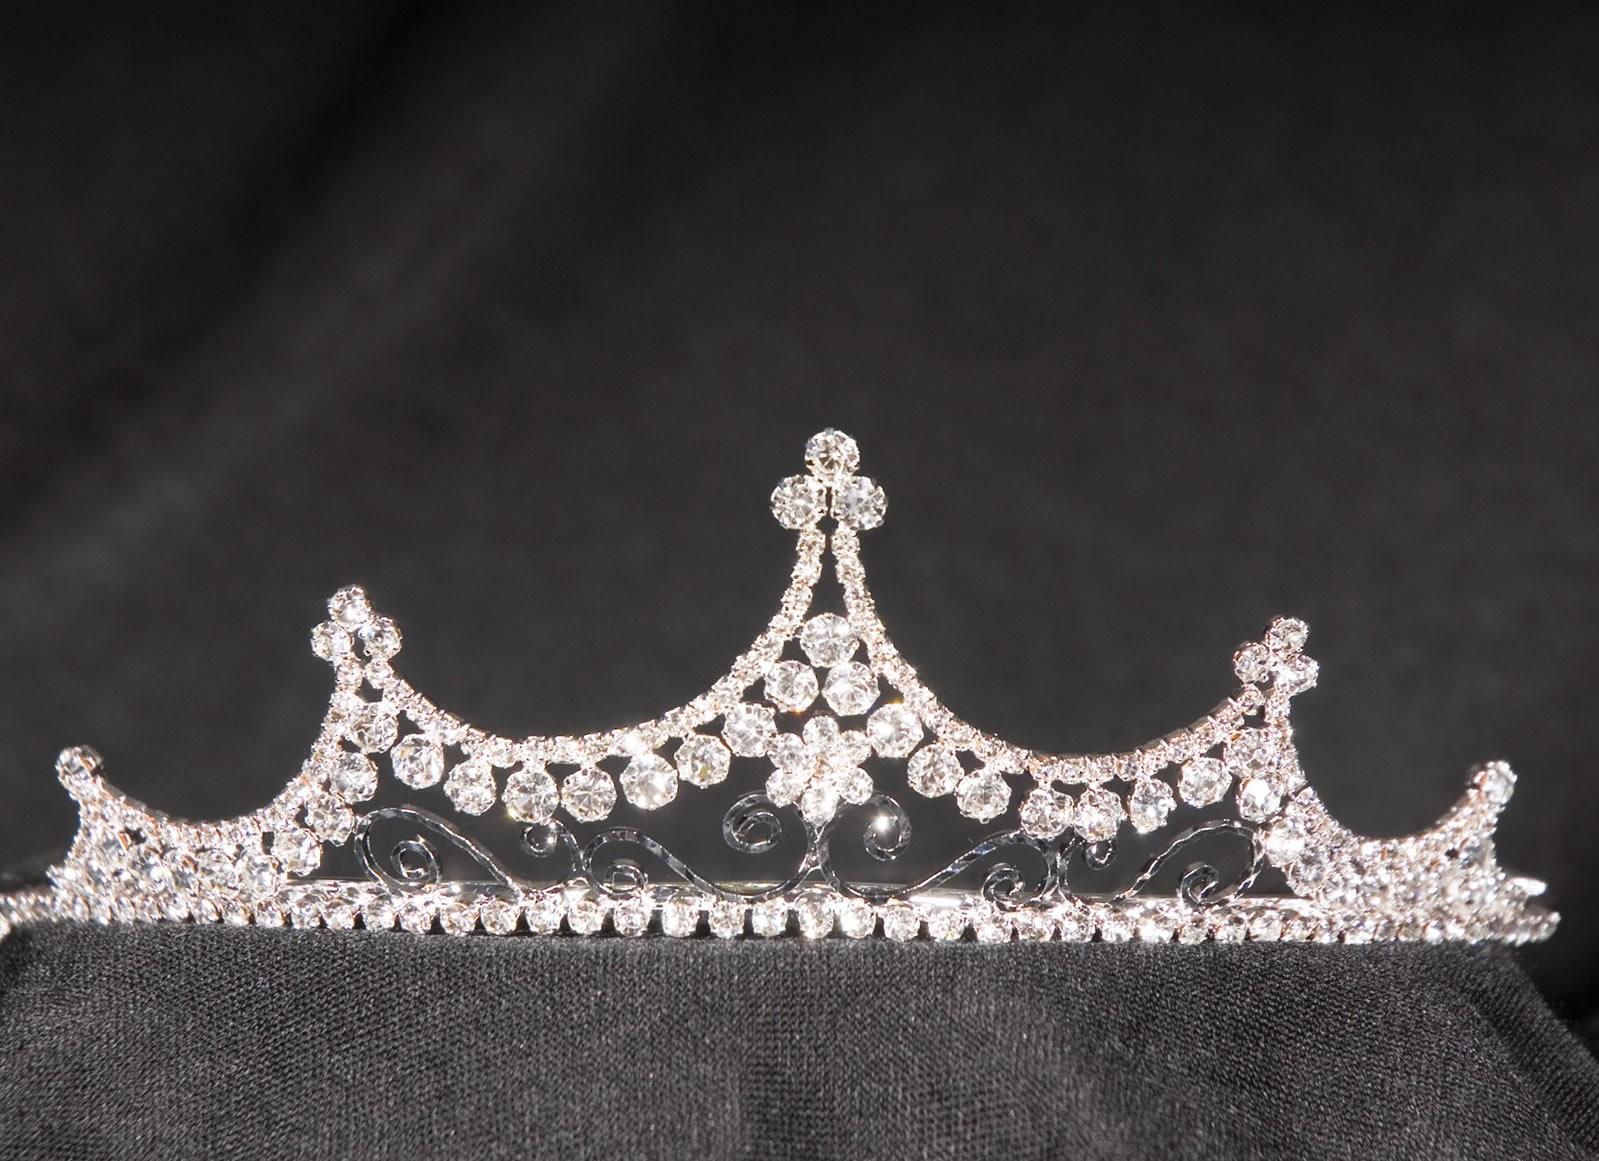 My Friend Debbie_The Crown Thing